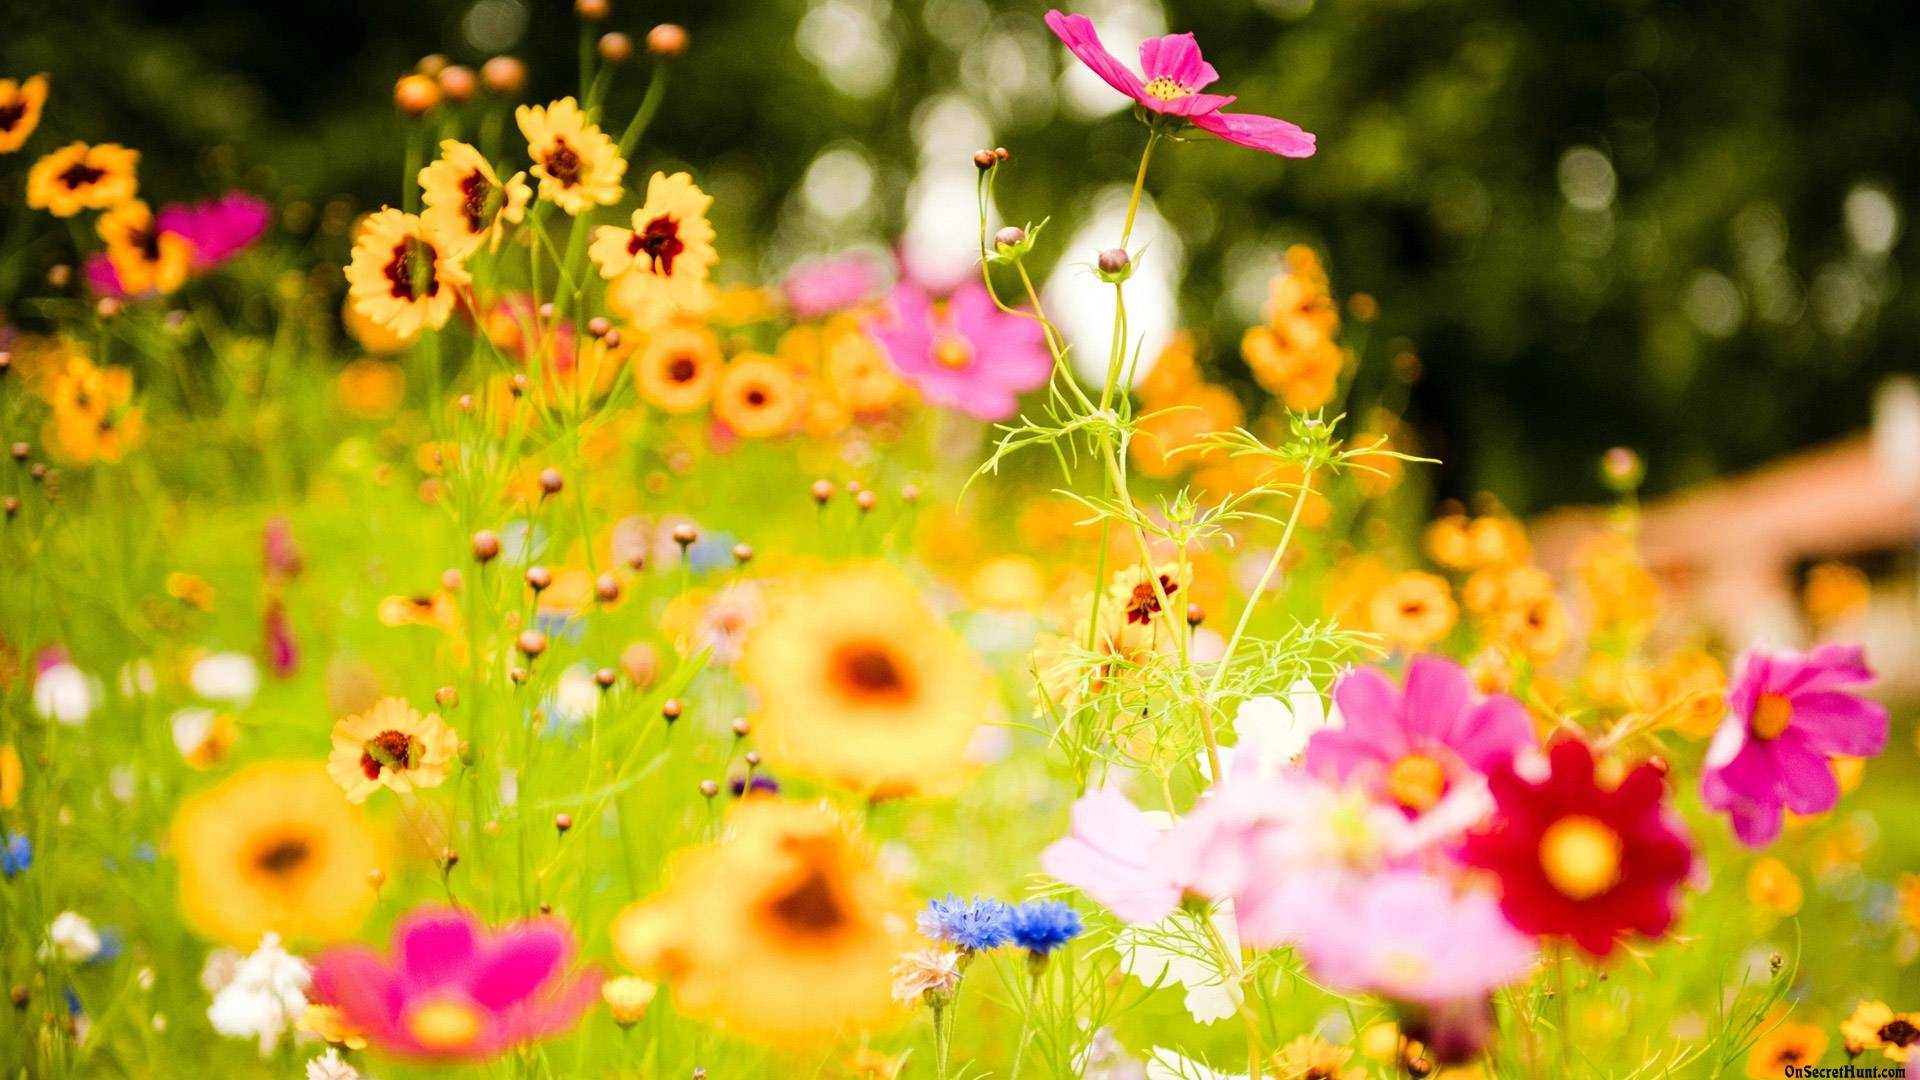 ... Wallpaper 6994481 Vivid Flowers Vivid Flowers 34856 1600x1000 Px Vivid Flowers